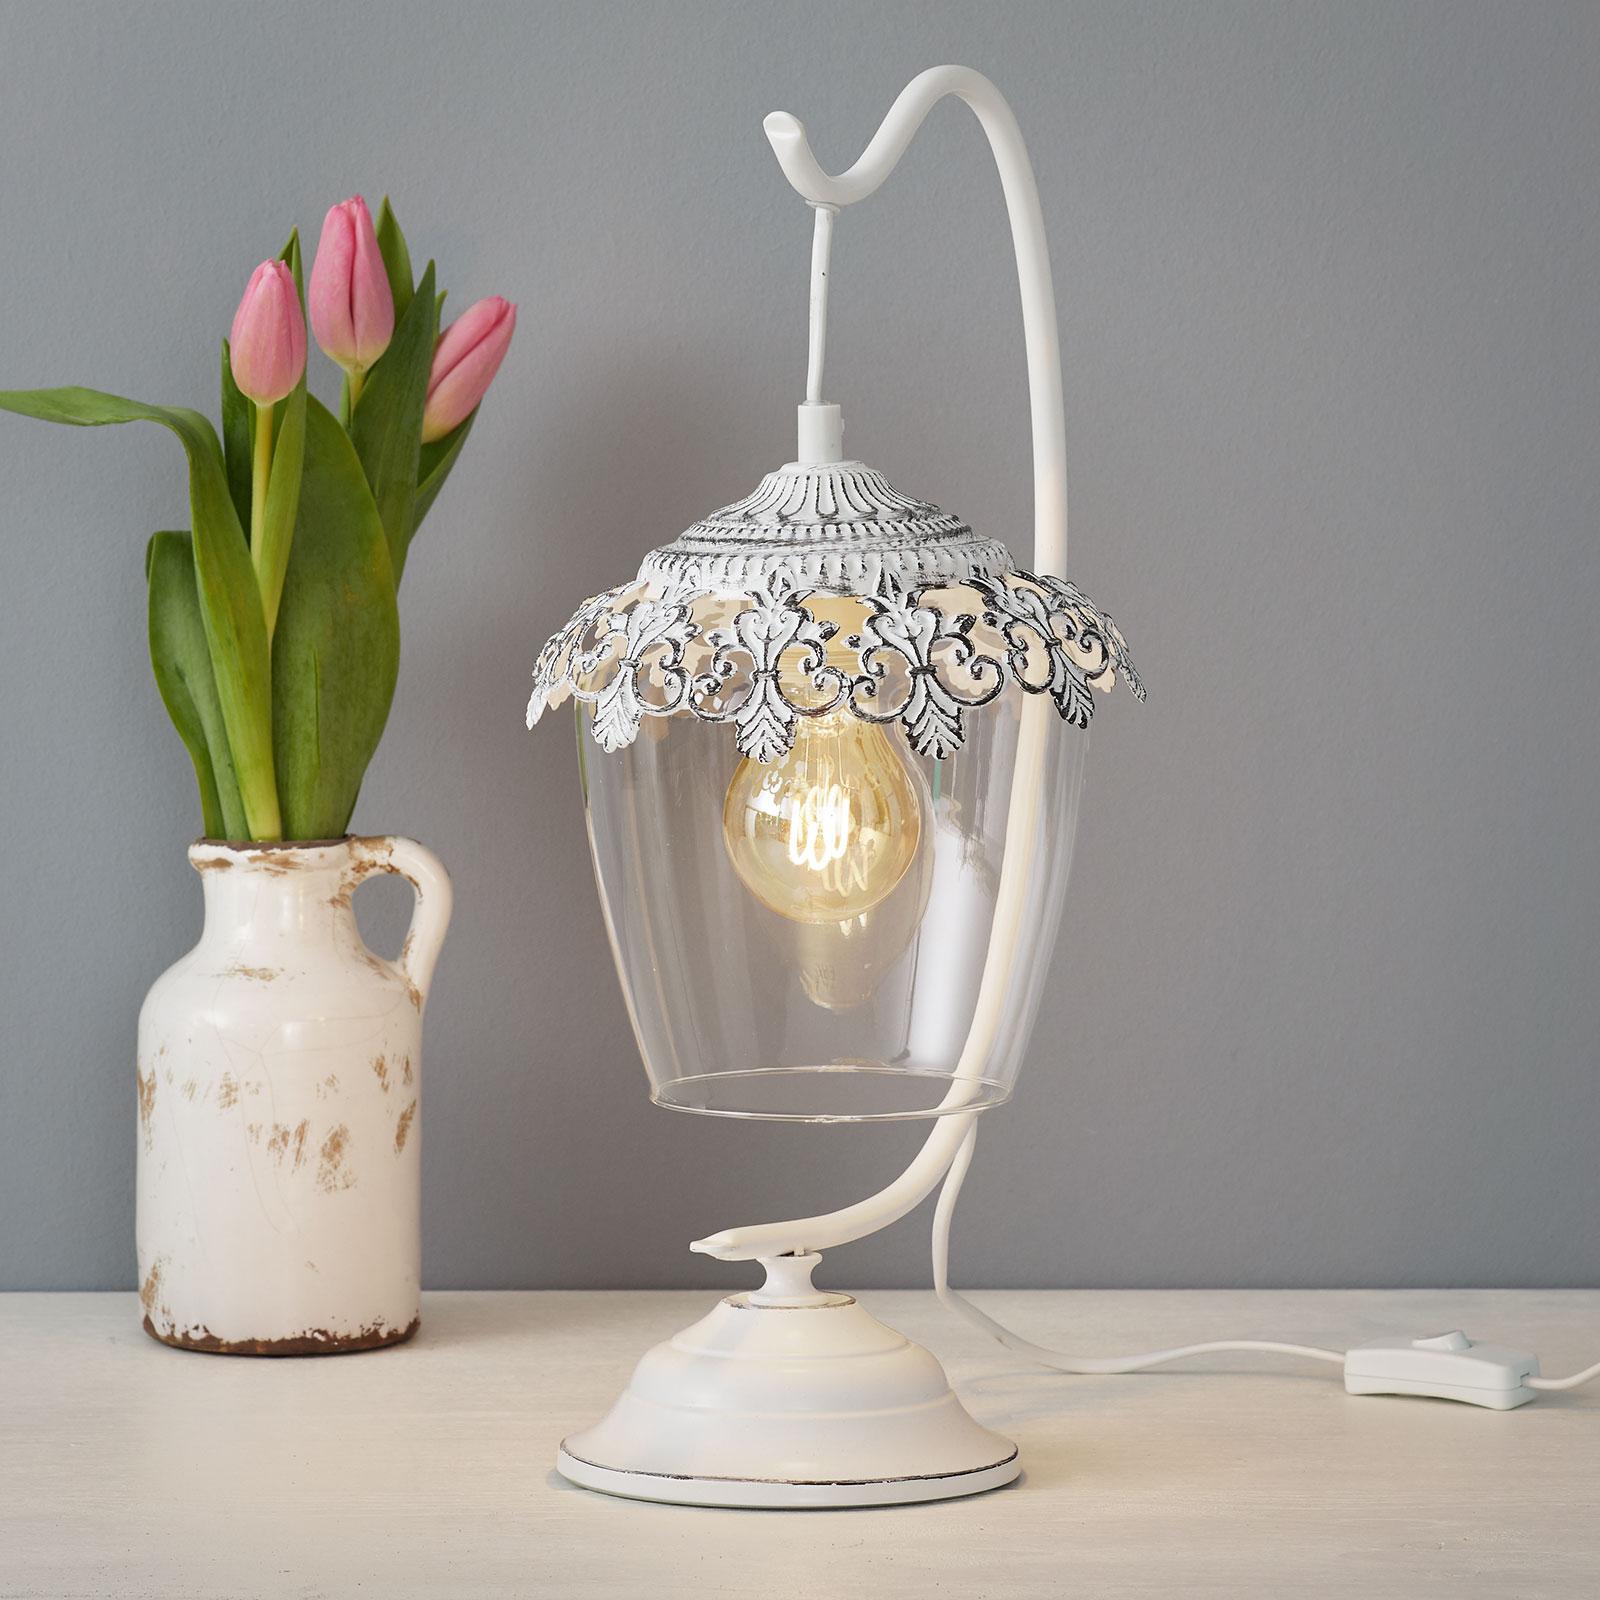 Florinia  Table Light Patinated White_3031593_1